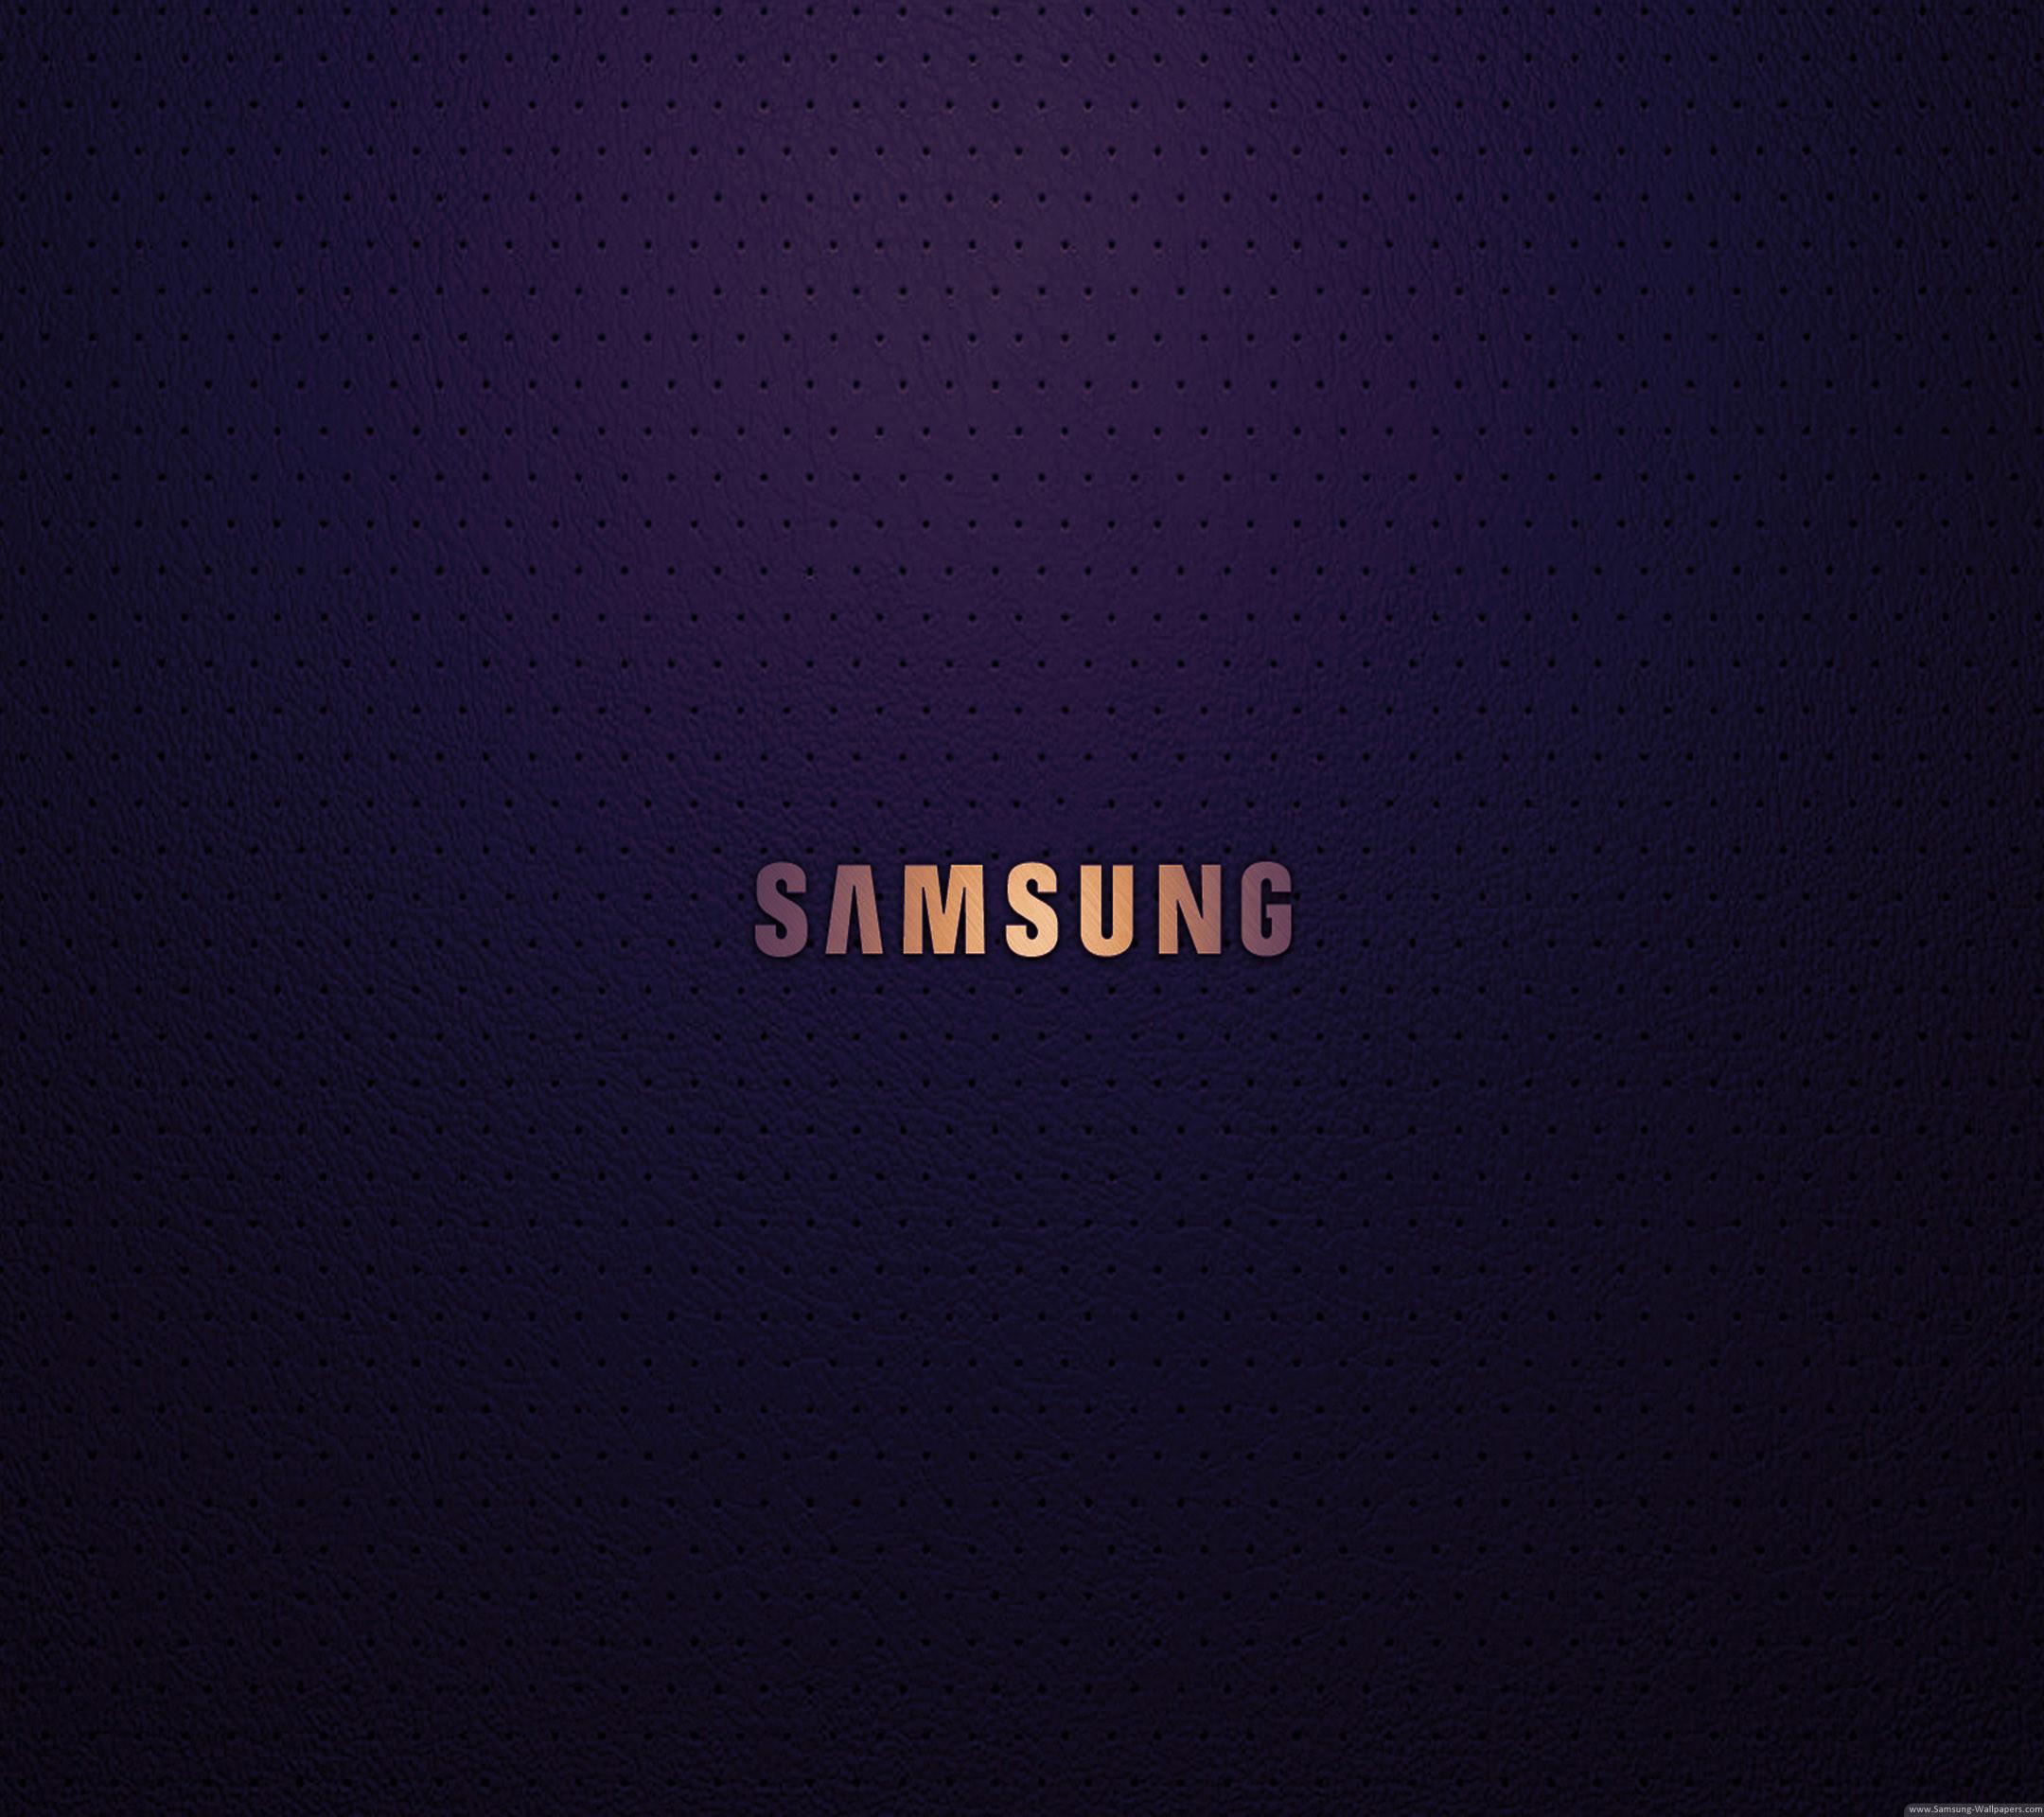 2160x1920 Samsung Logo Background Lock Screen Galaxy Samsung Logo Wallpaper Red 2160x1920 Wallpaper Teahub Io